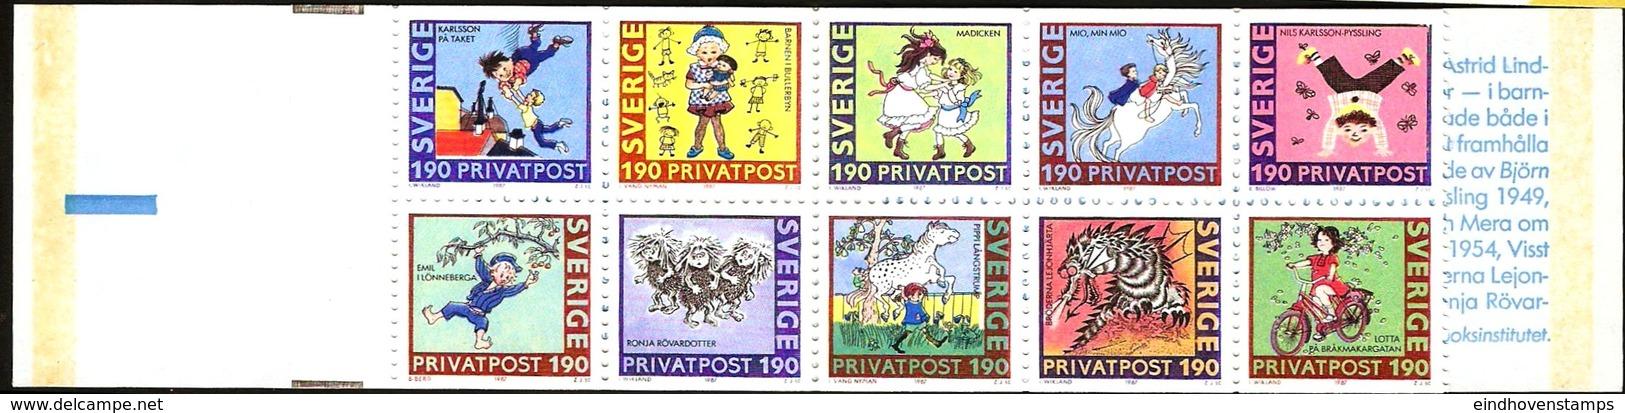 Sweden 1987 Birthday Astrid Lindgren Pippi And Stories Stamp Rabat Booklet MNH - Fairy Tales, Popular Stories & Legends